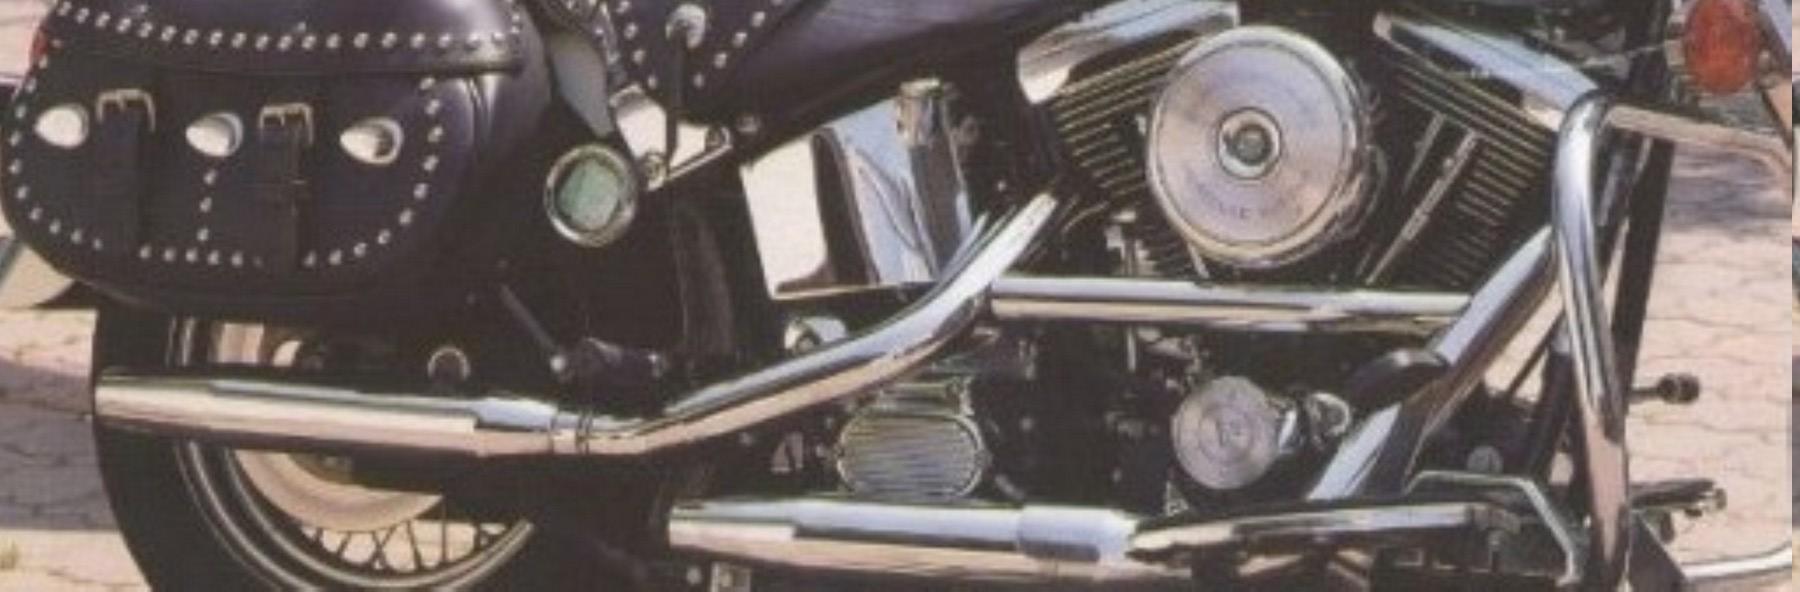 HARLEY-DAVIDSON HERITAGE SOFTAIL 1340 DE JOHNNY HALLYDAY ( 1989 ) 0413